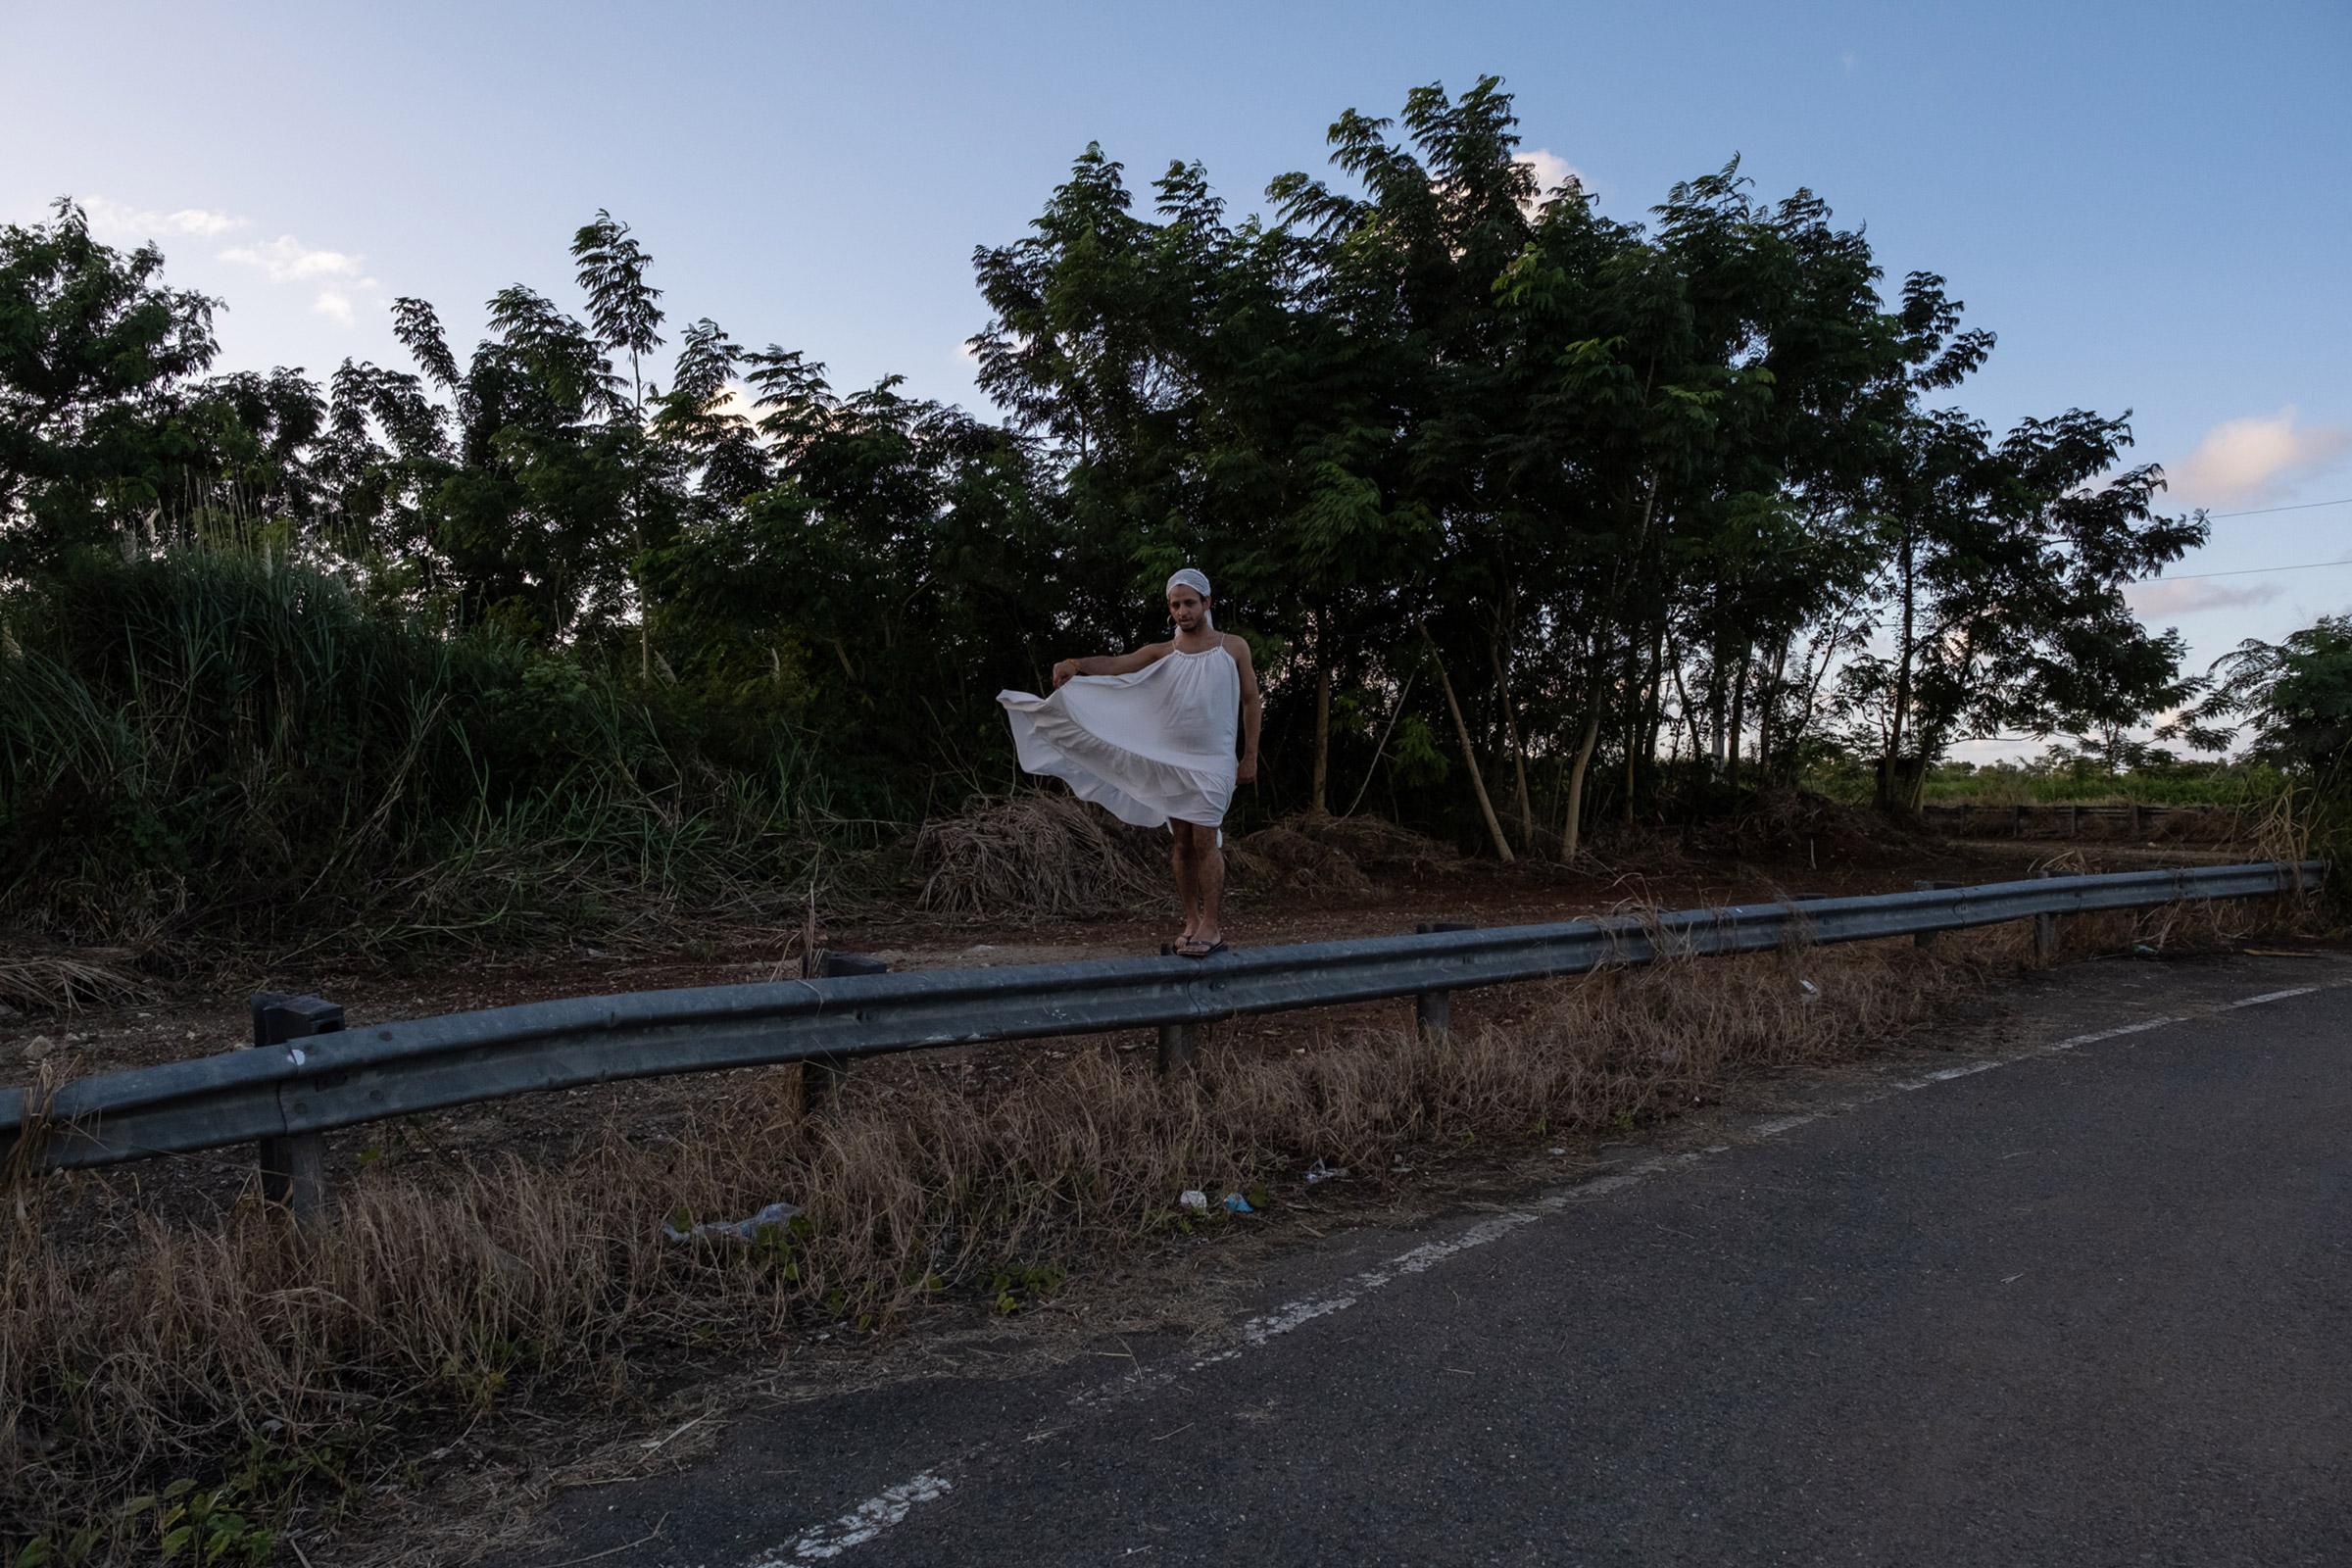 Gabi Grace, 21, poses for a portrait in Toa Baja, Puerto Rico.